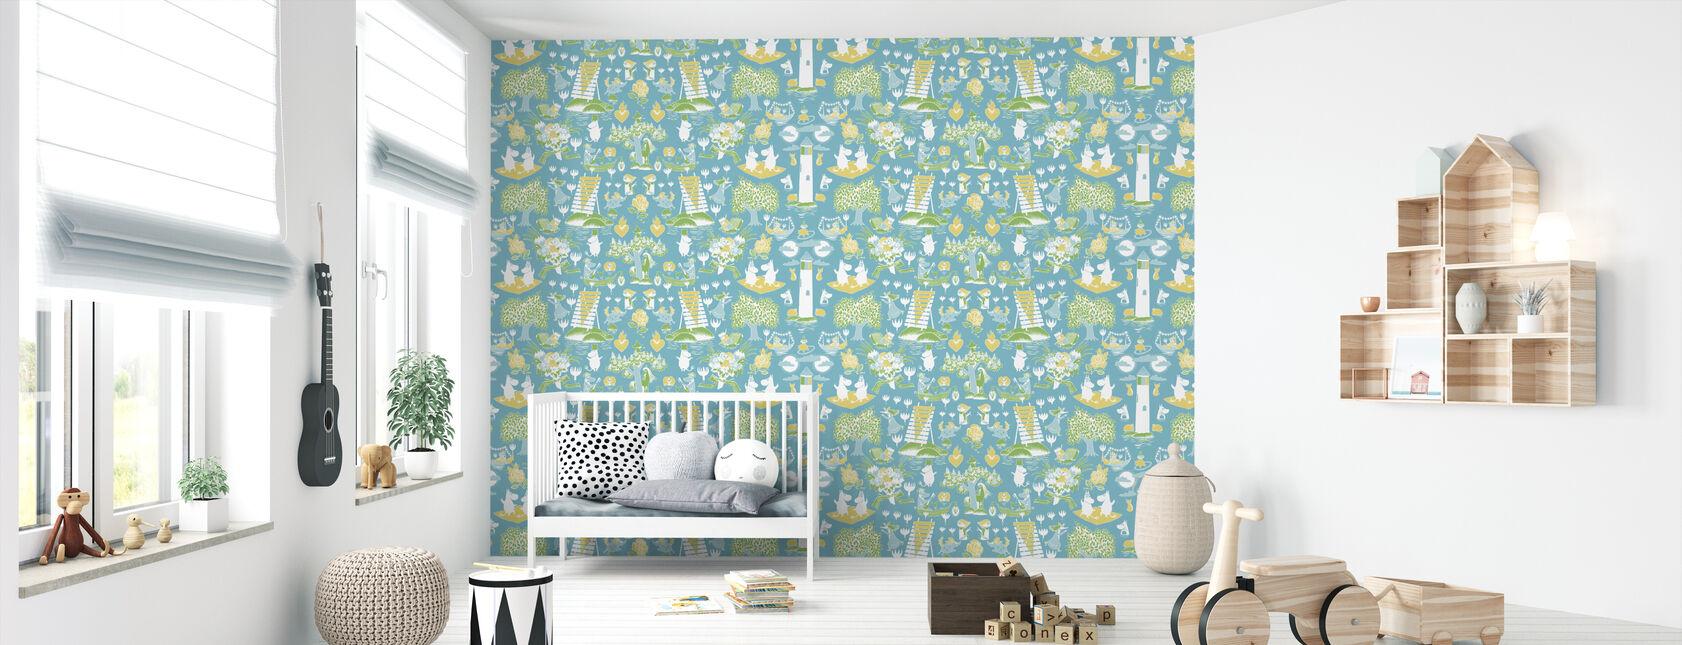 Moomin Retro Mønster - Blå & Grøn - Tapet - Babyværelse